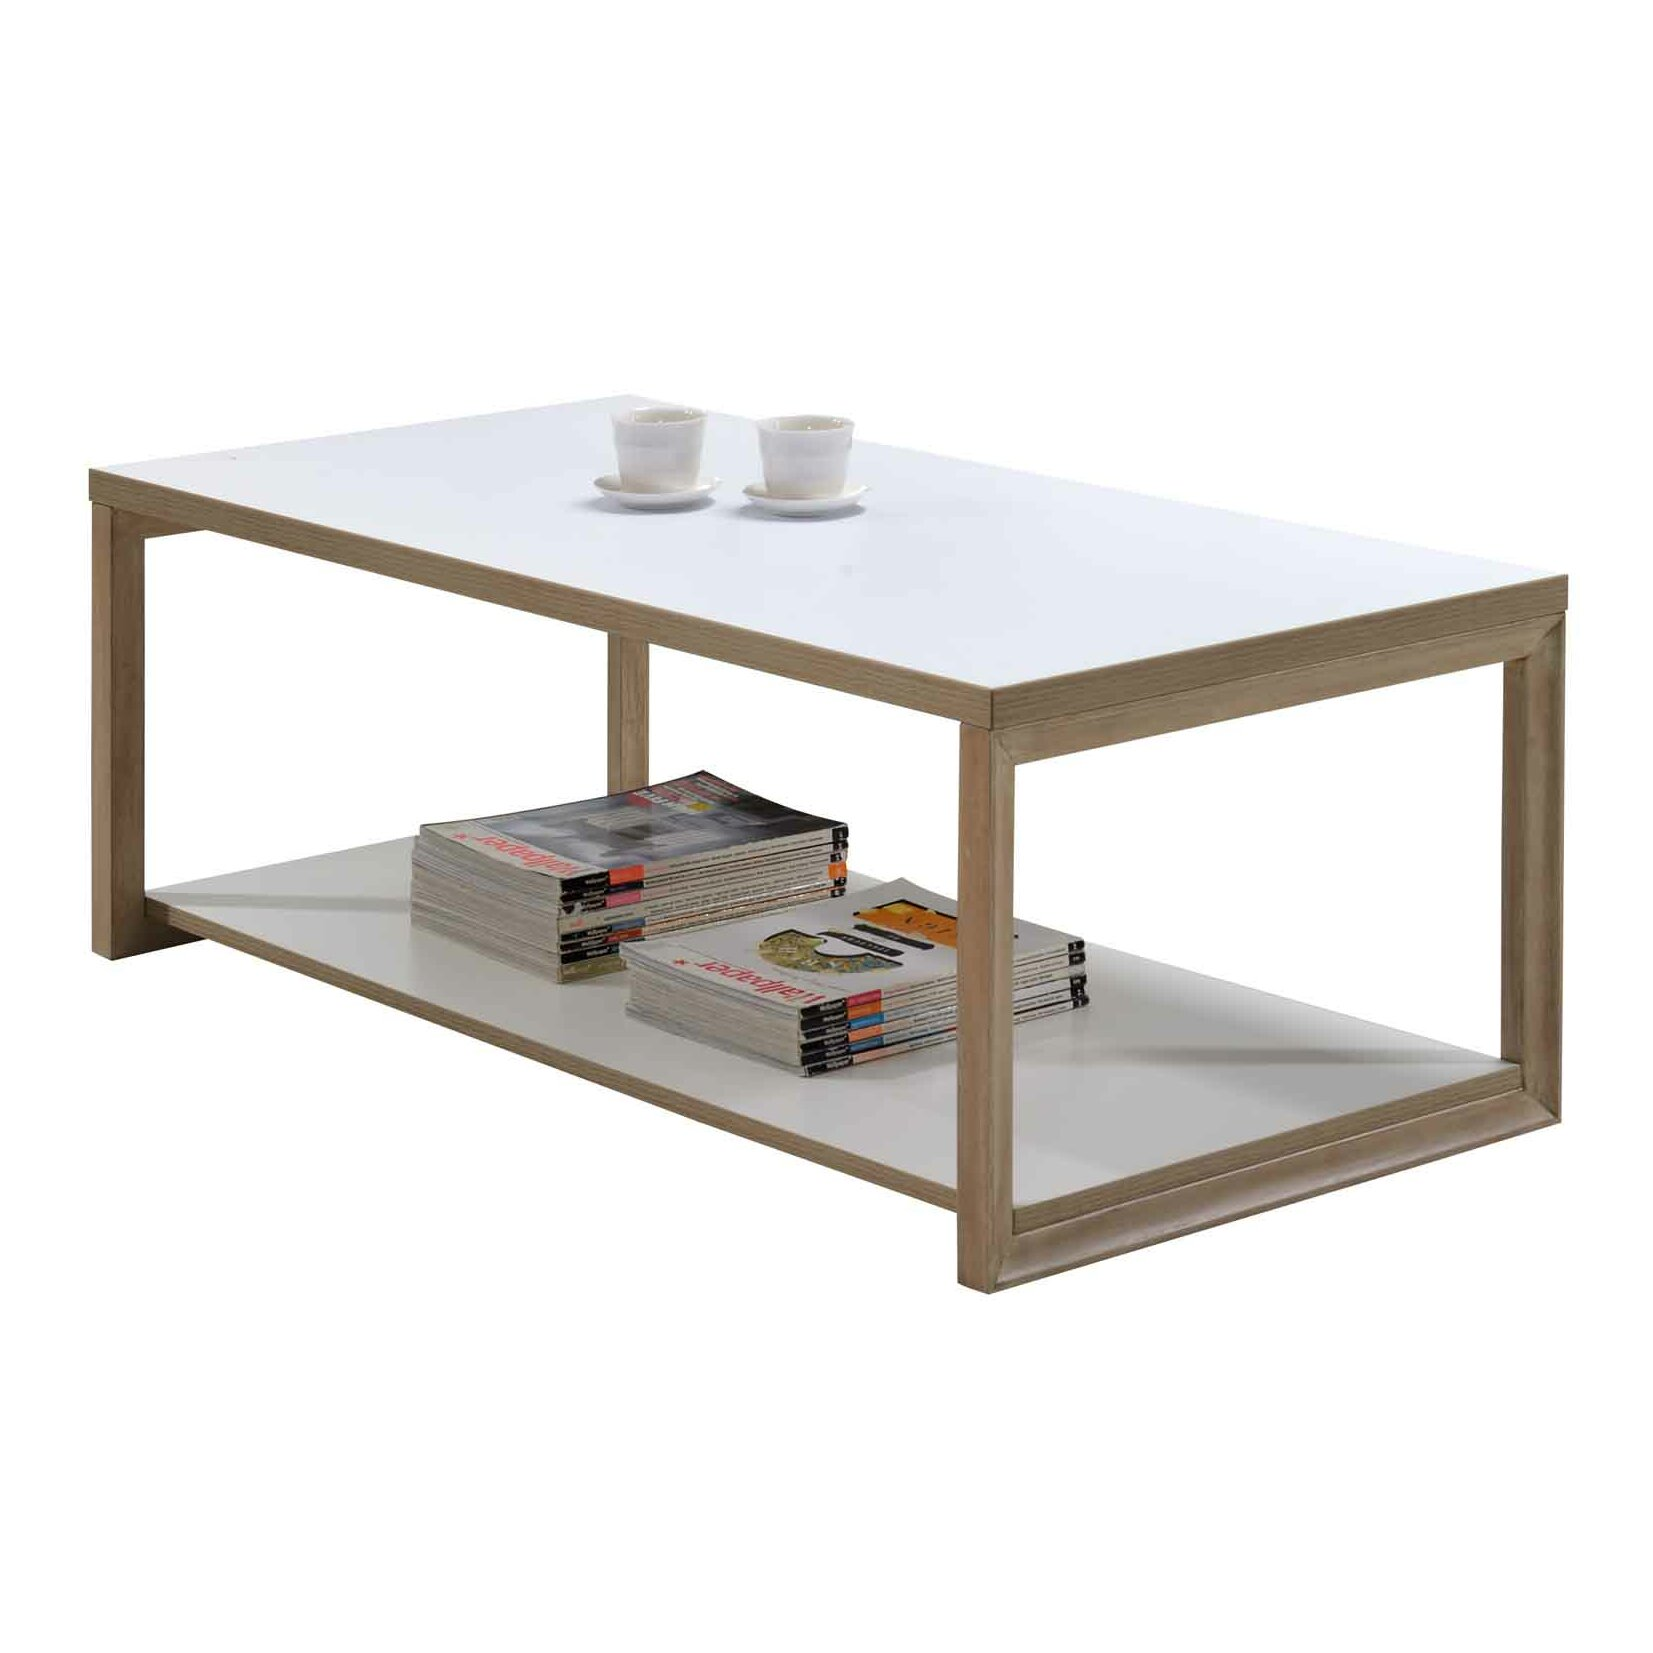 Imagio Home Lifestyle Studio Living Coffee Table amp Reviews  : LifestyleStudioLivingCoffeeTable from www.wayfair.ca size 1653 x 1653 jpeg 117kB